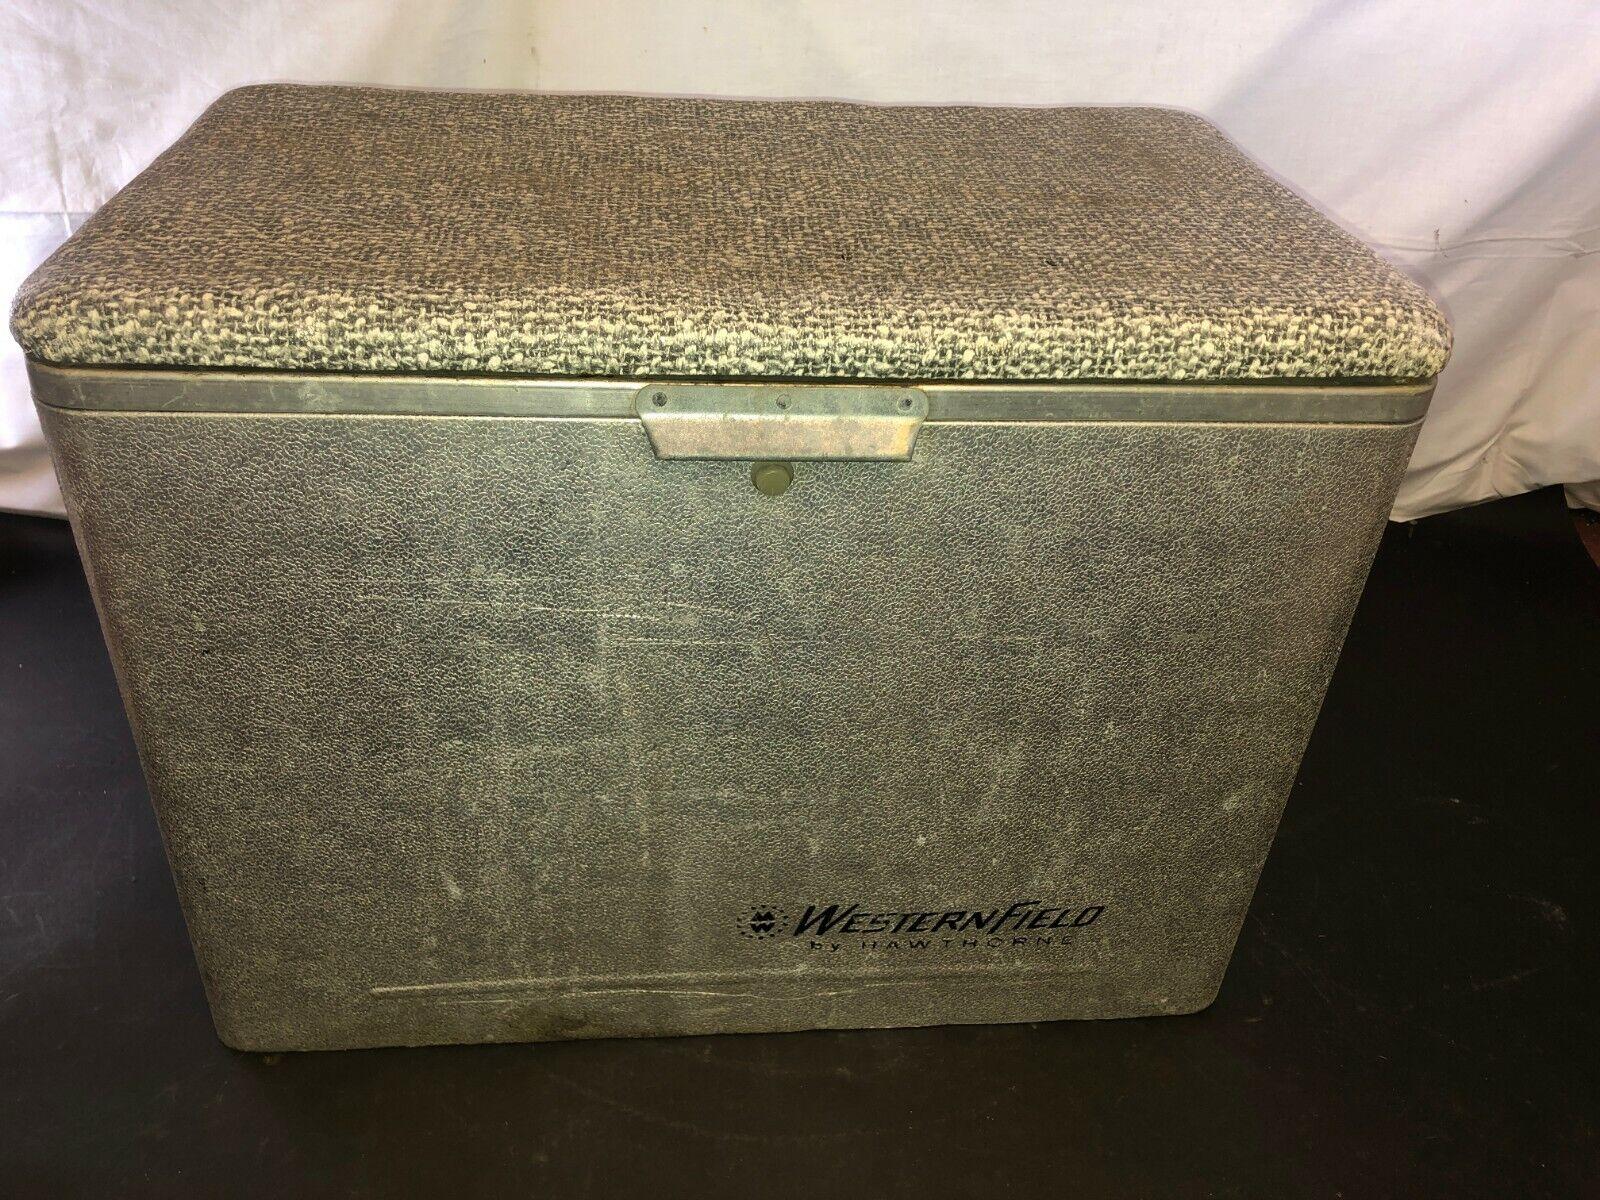 Vintage Hawthorne cronstroms occidental Campo Metal Cooler pecho de hielo